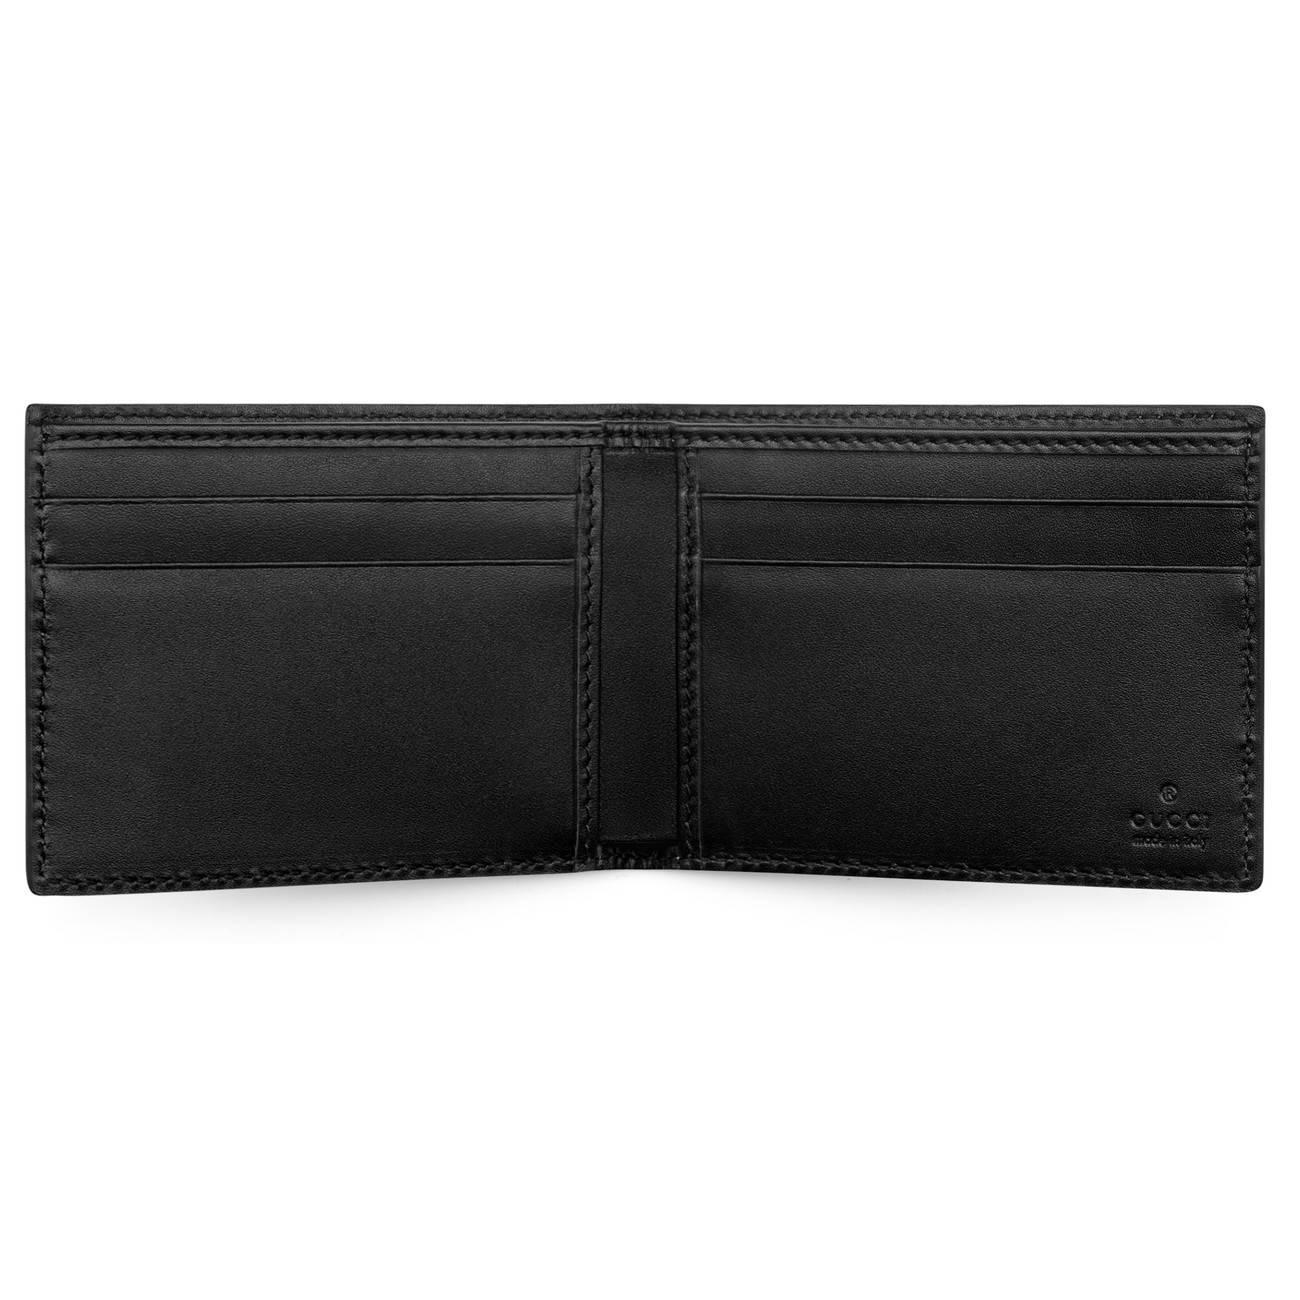 03f3e0cbb57f Gucci - Multicolor Kingsnake Print GG Supreme Wallet for Men - Lyst. View  fullscreen